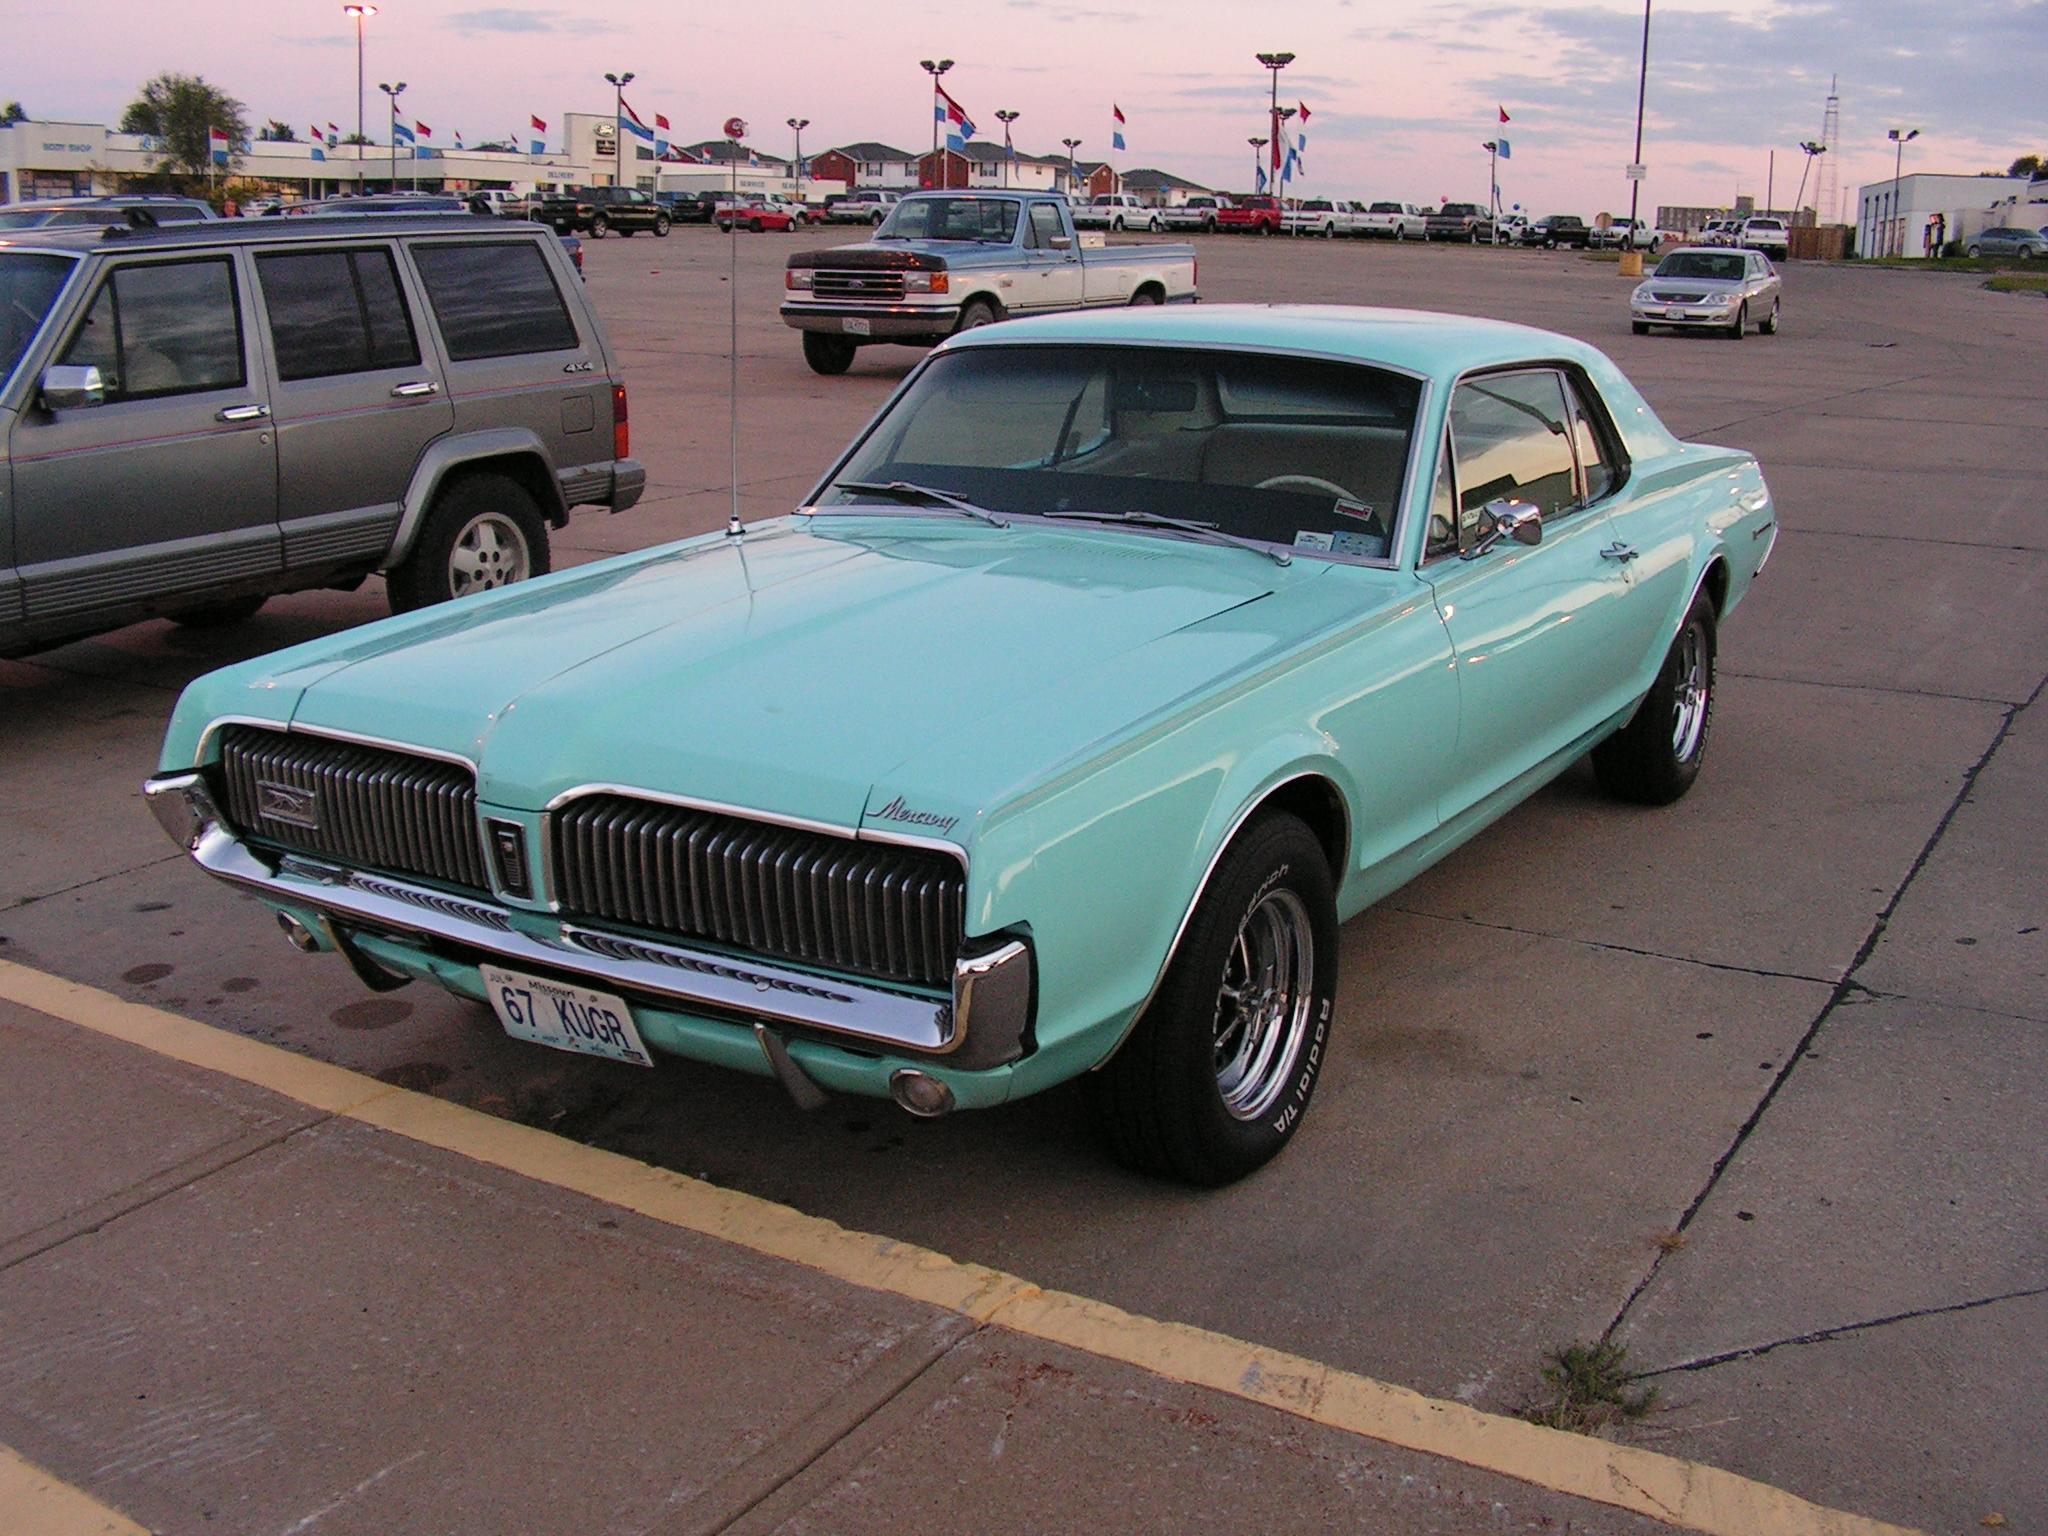 Mercury cougar 1024 x 770 1967 mercury cougar 1280 x 1080 1967 mercury